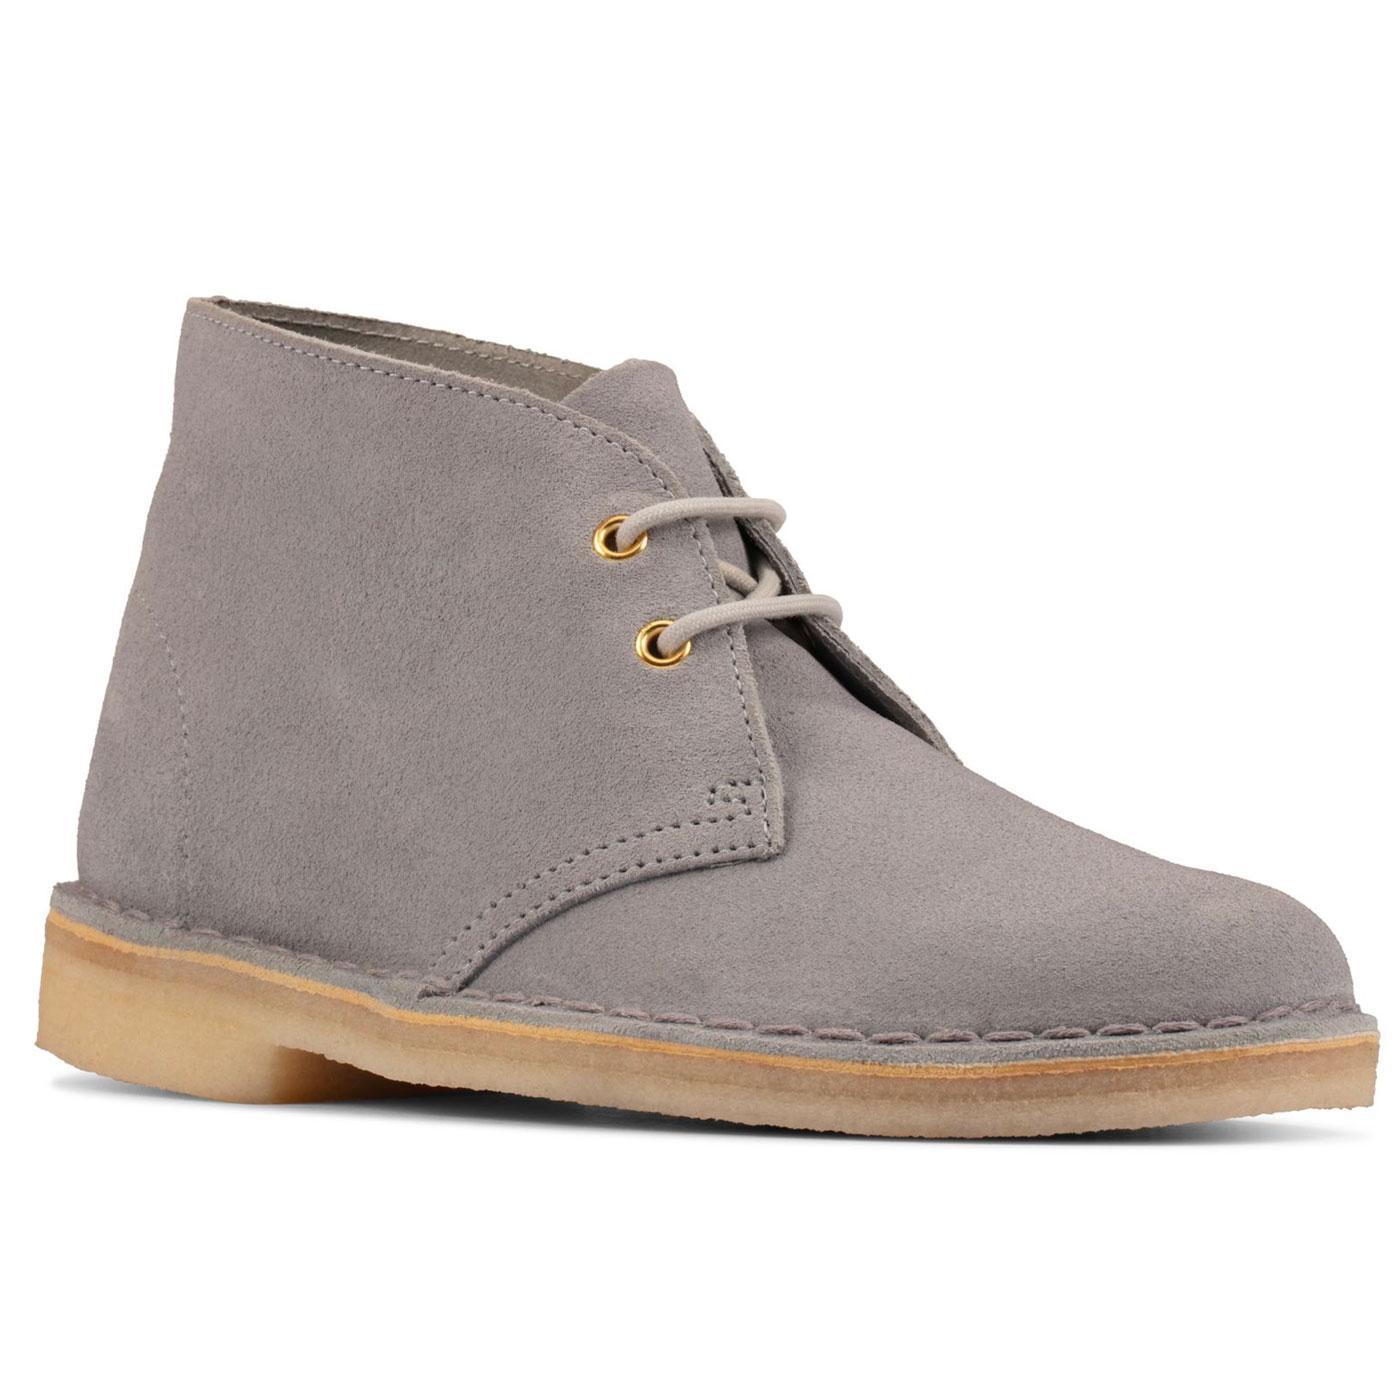 CLARKS ORIGINALS Women's Desert Boots (Blue-Grey)